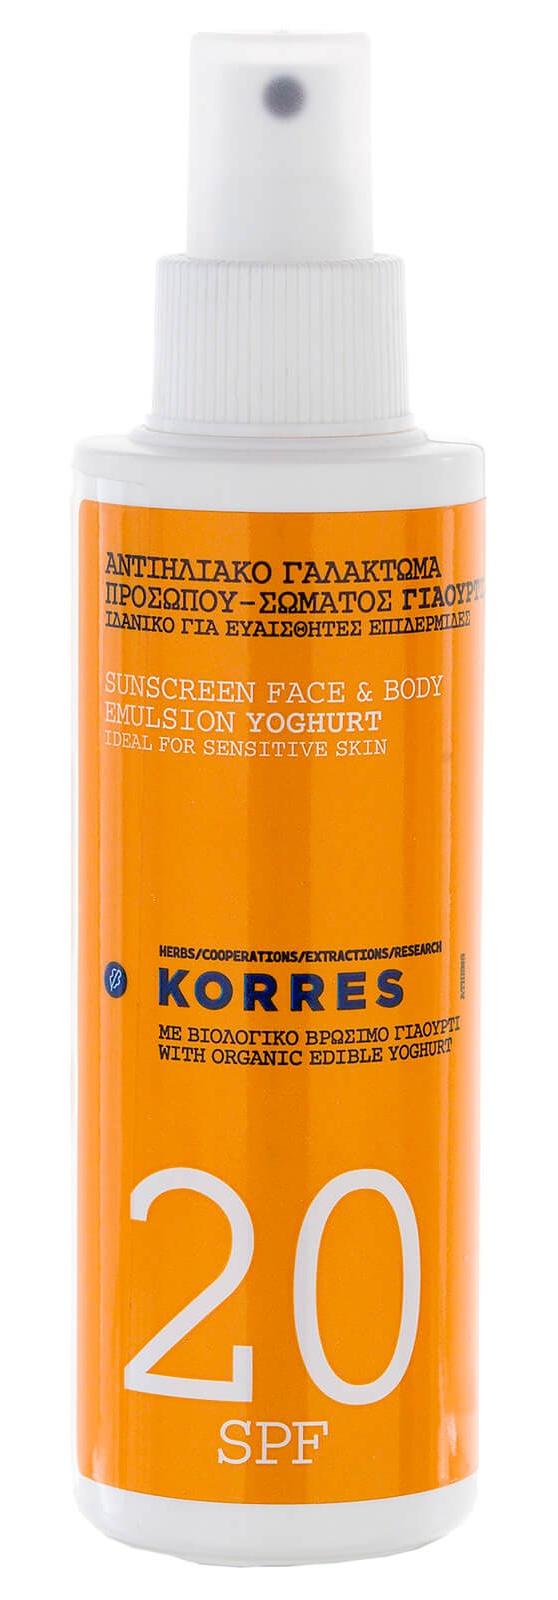 Korres Yogurt Face & Body Sunscreen Lotion Spf20